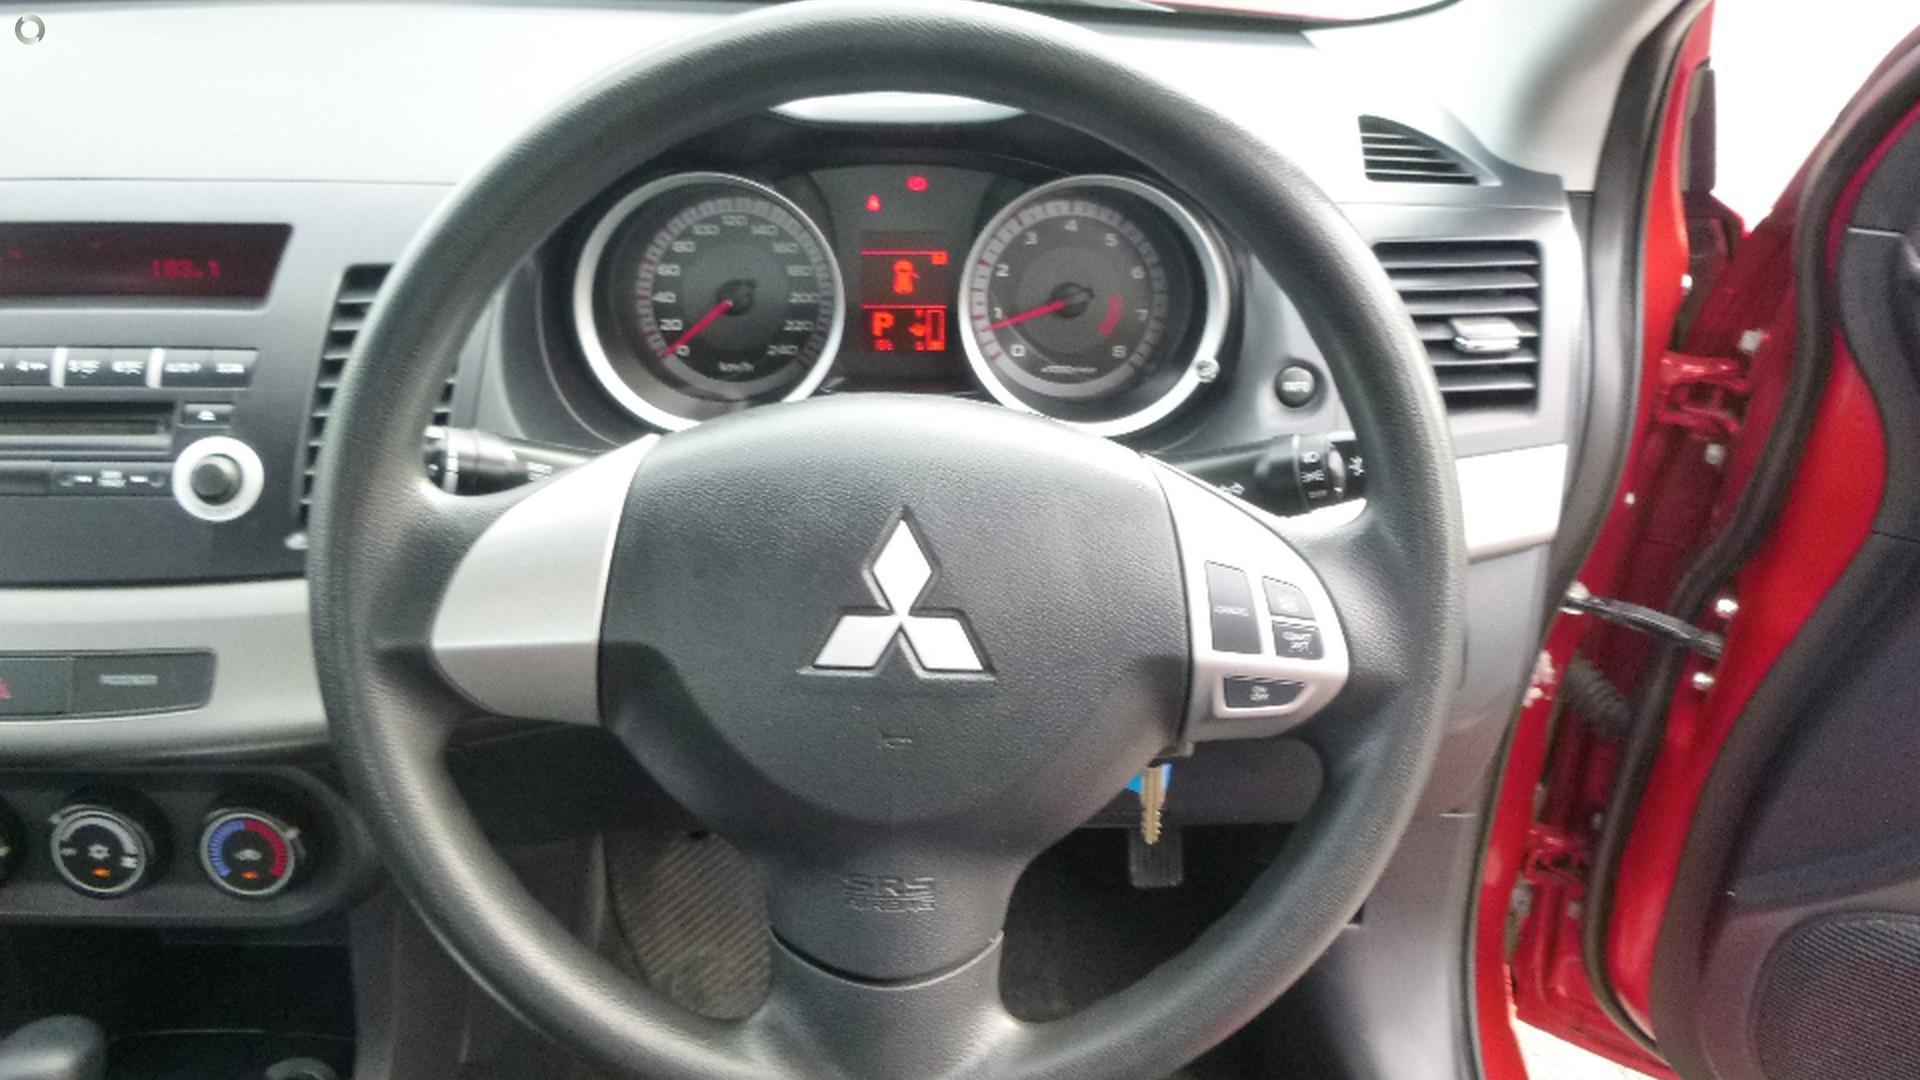 2008 Mitsubishi Lancer ES CJ